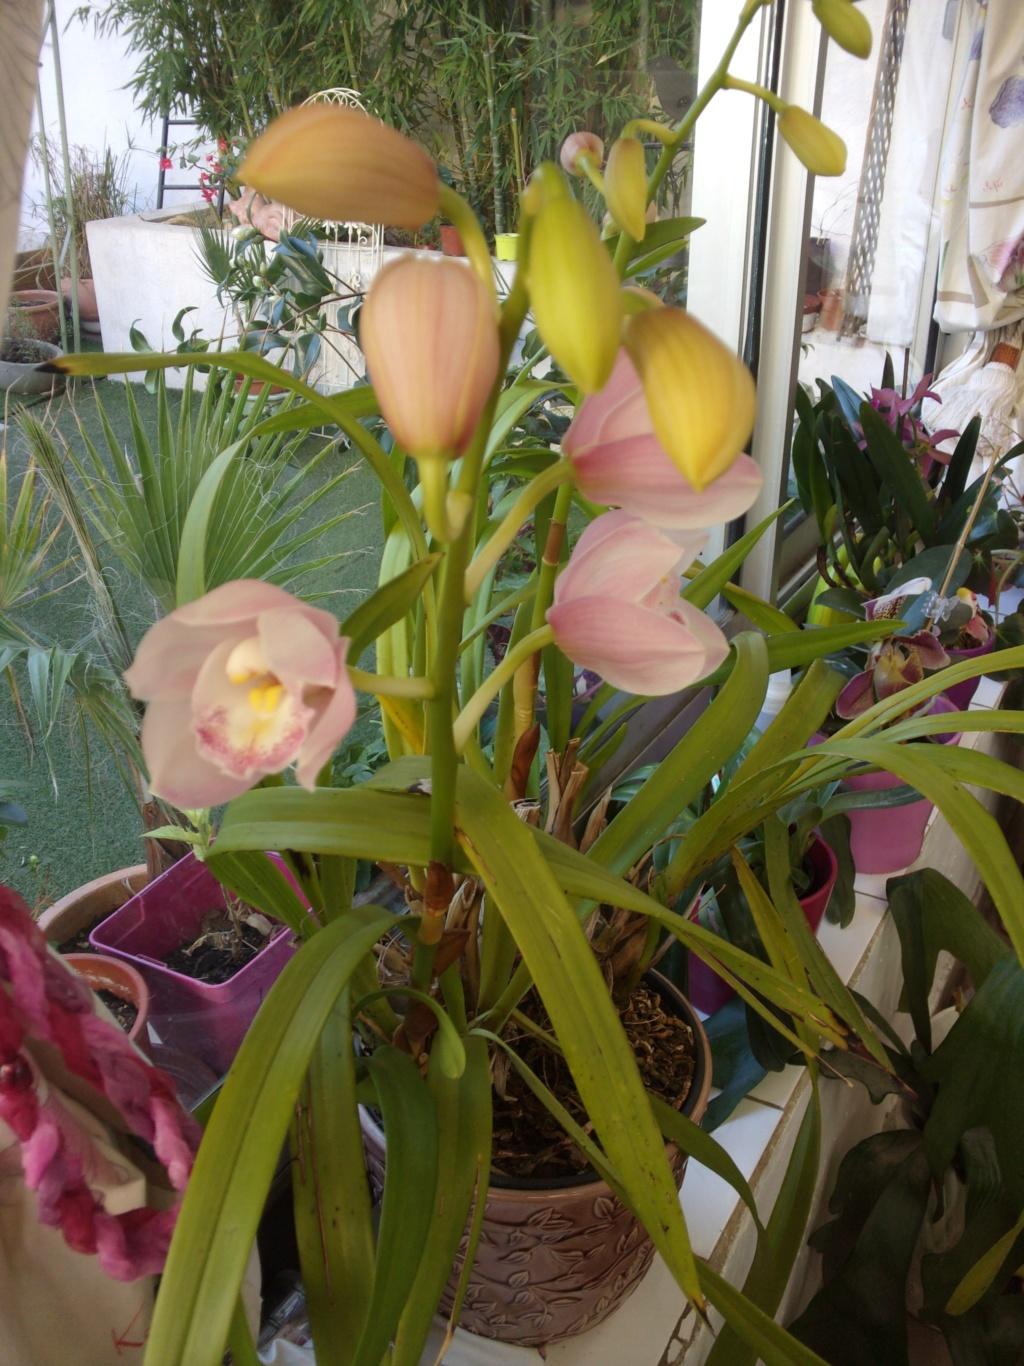 Mes plantes dans la véranda - Page 8 00840